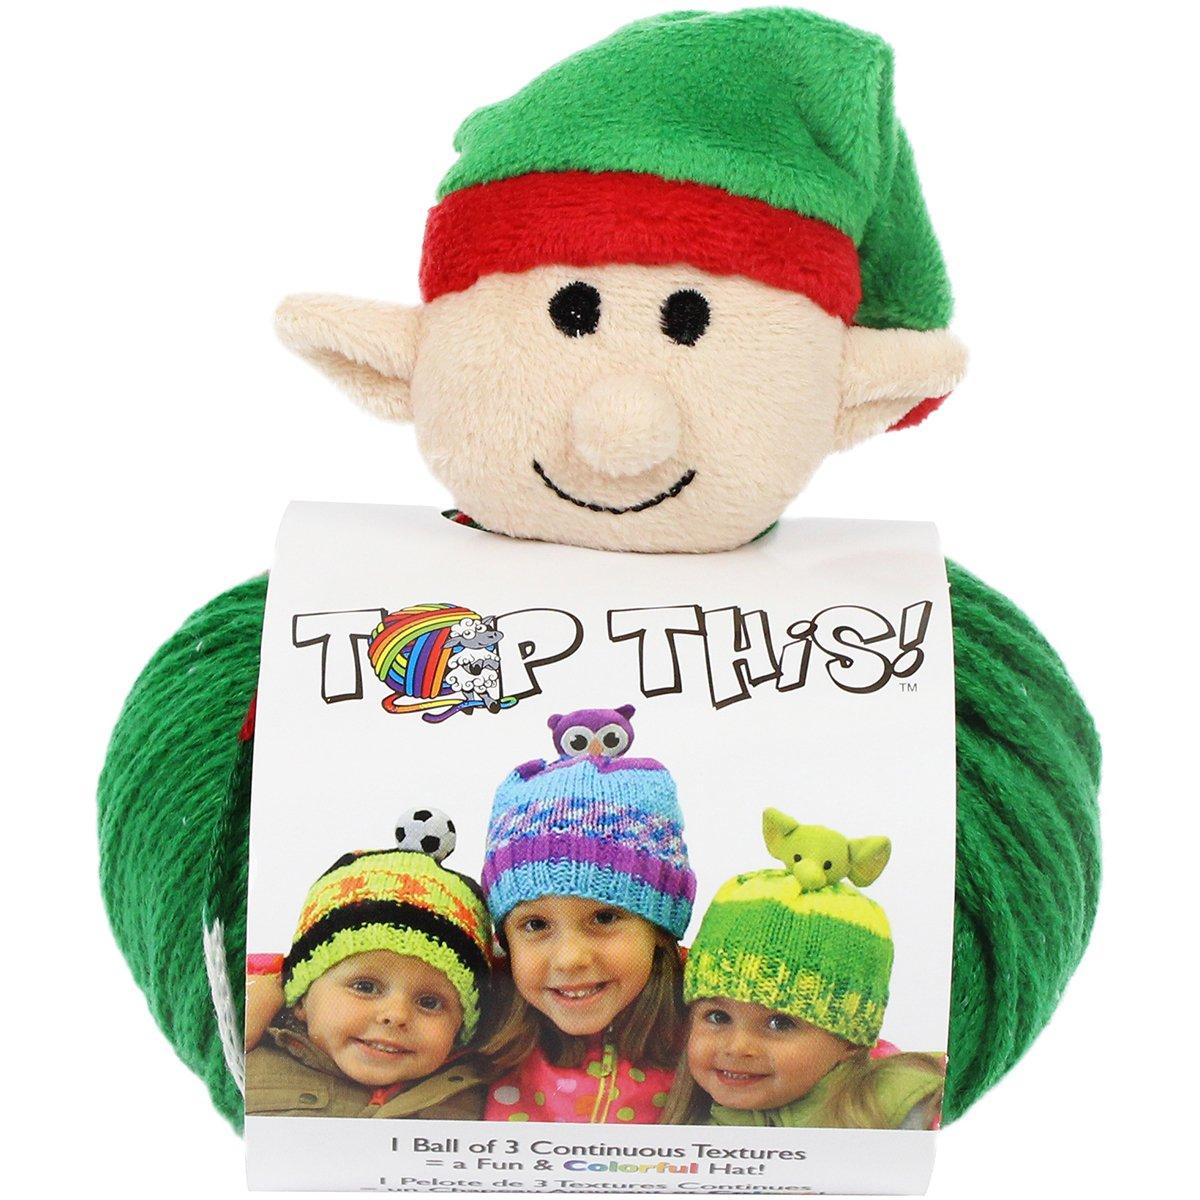 Top This! Elf Yarn Kit